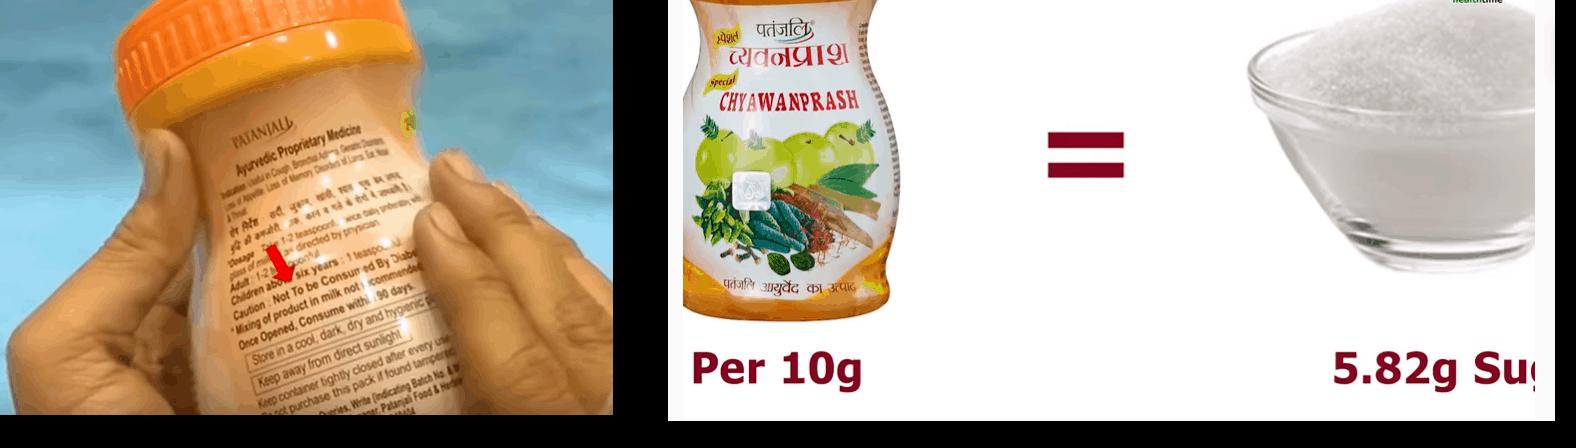 Patanjali Chyawanprash Harsh Reality